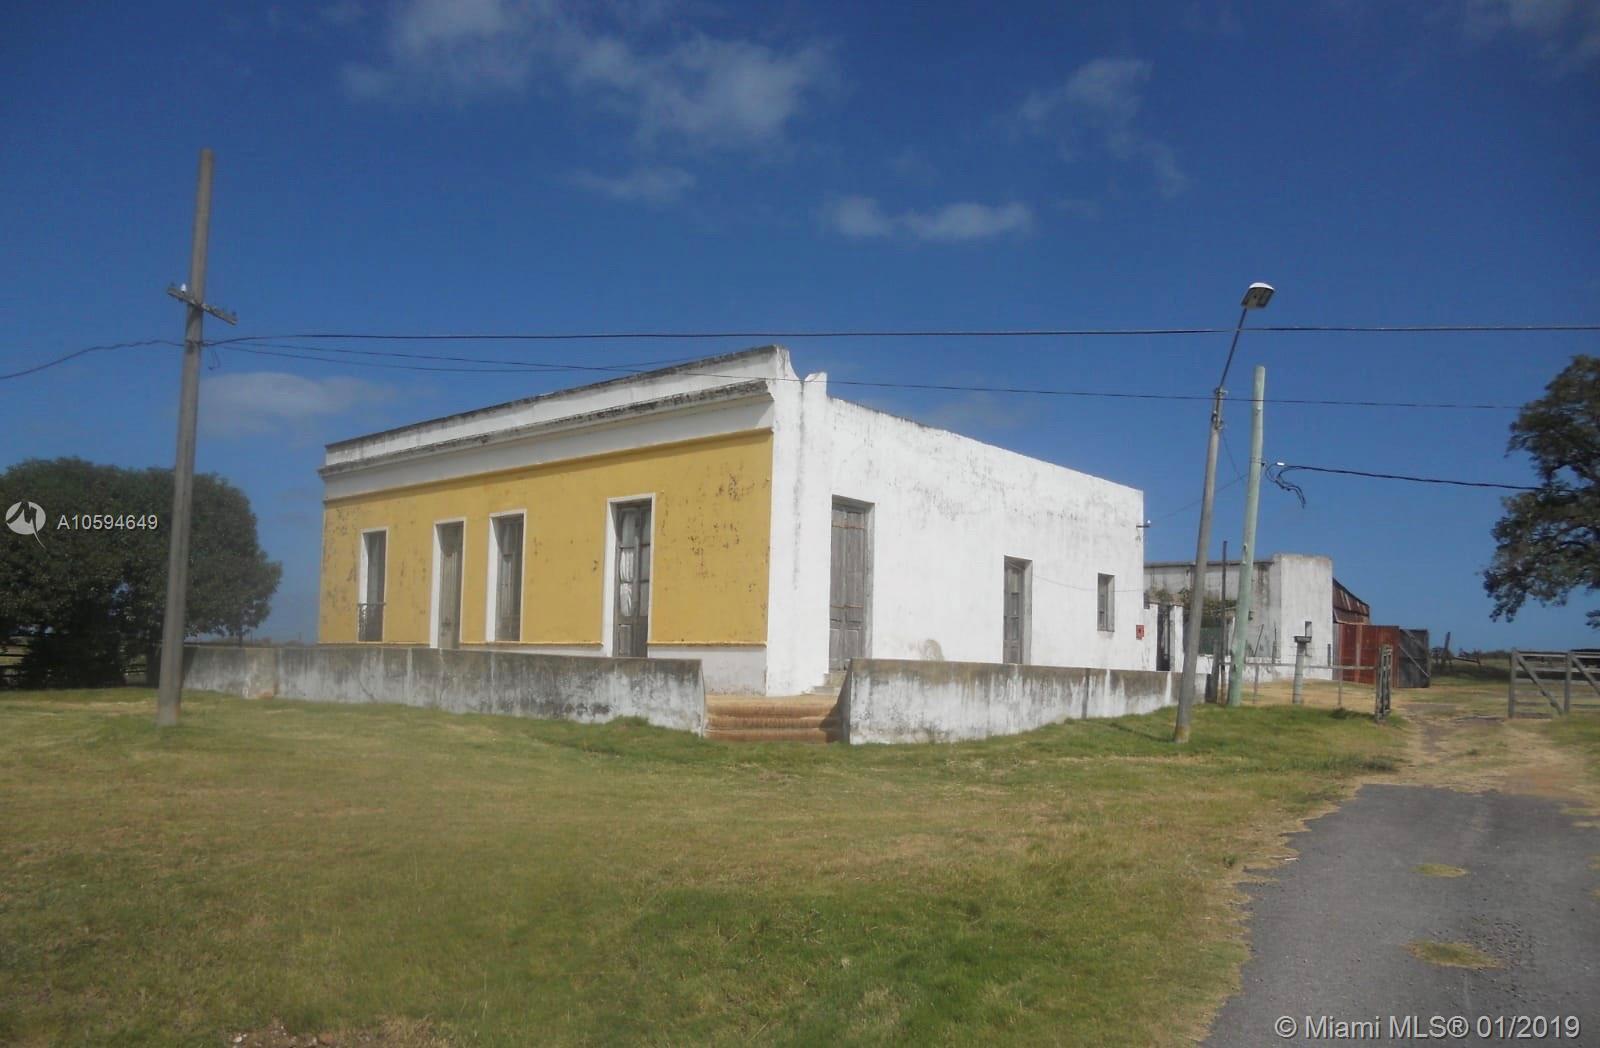 Km 89, 300 Ruta 9 Maldonado Uruguay, Nevada 89300, ,Land/boat Docks,For Sale,Km 89,300 Ruta 9 Maldonado Uruguay,A10594649